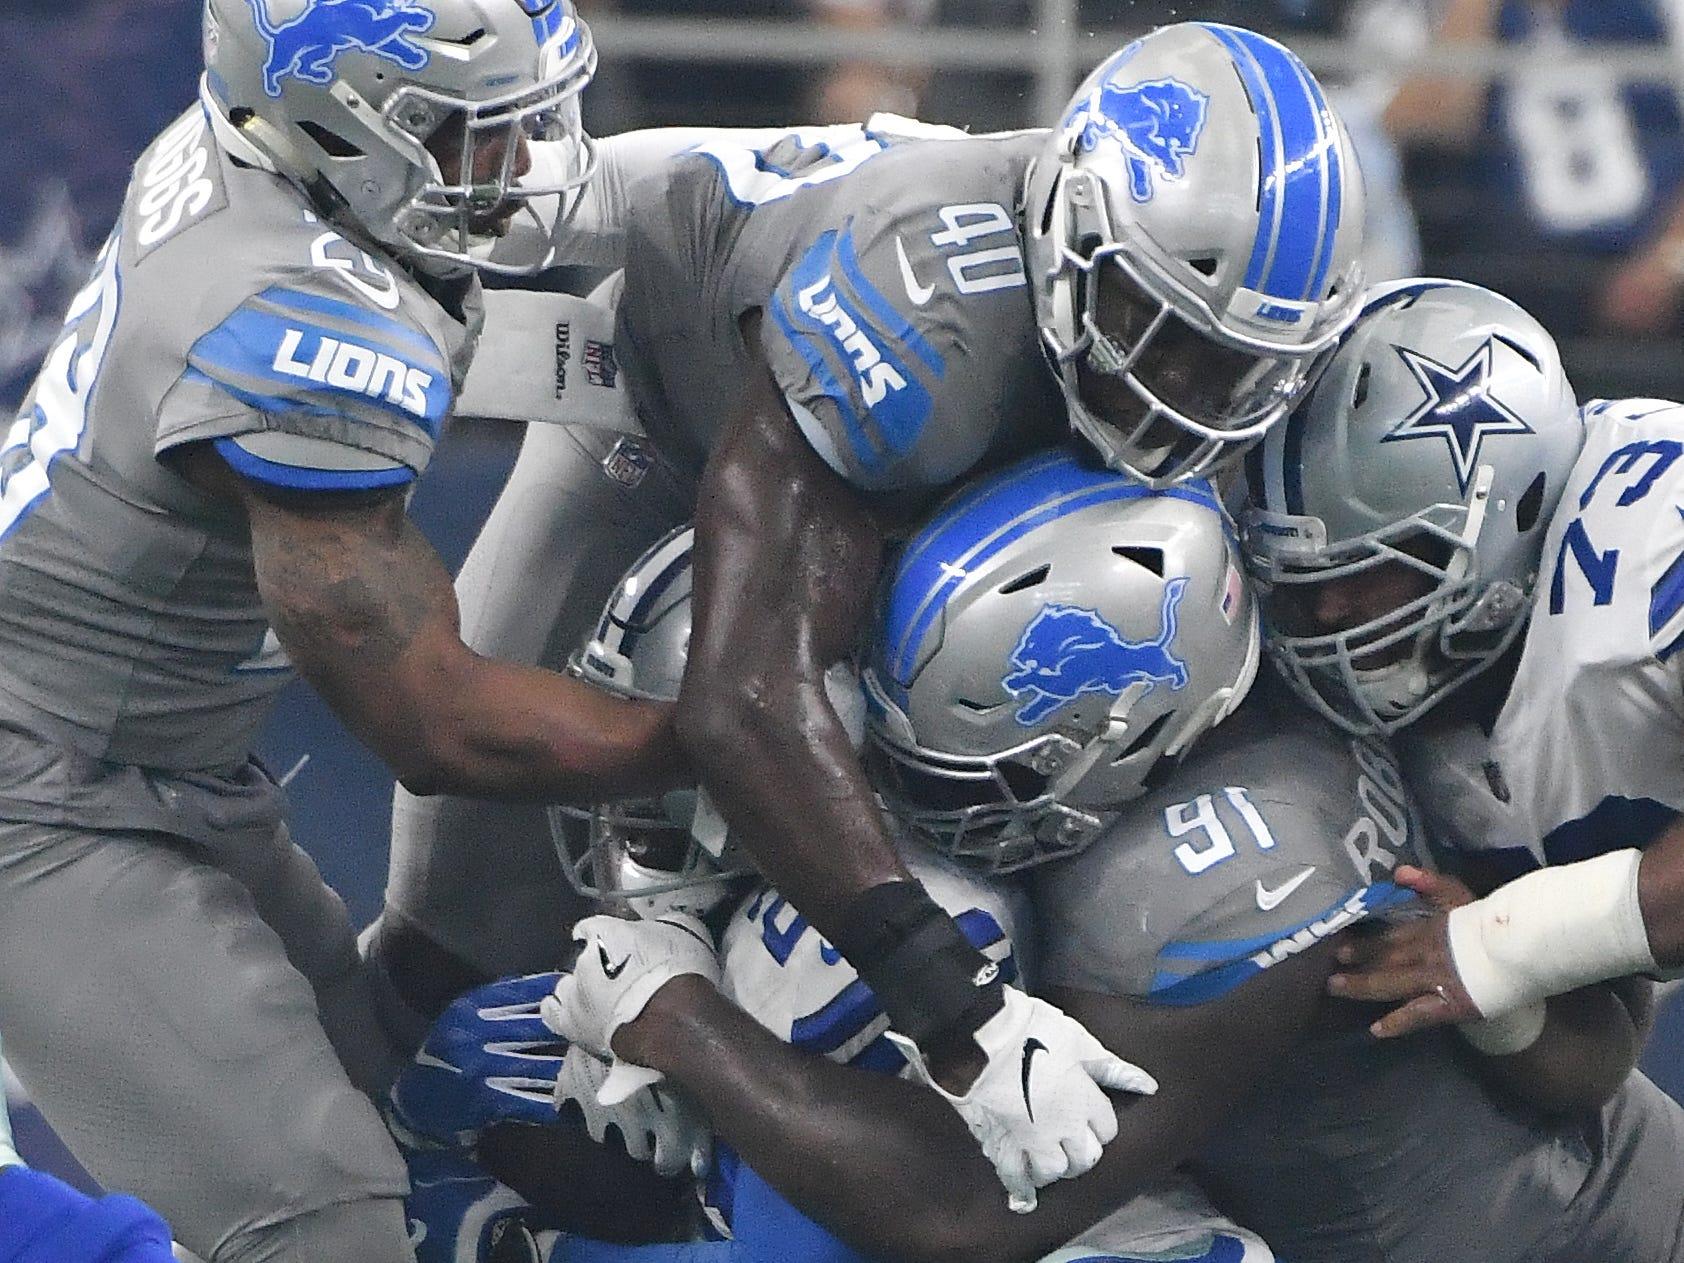 Lions' Quandre Diggs, Jarrad Davis and A'Shawn Robinson bring down Cowboys running back Ezekiel Elliott in the first quarter.